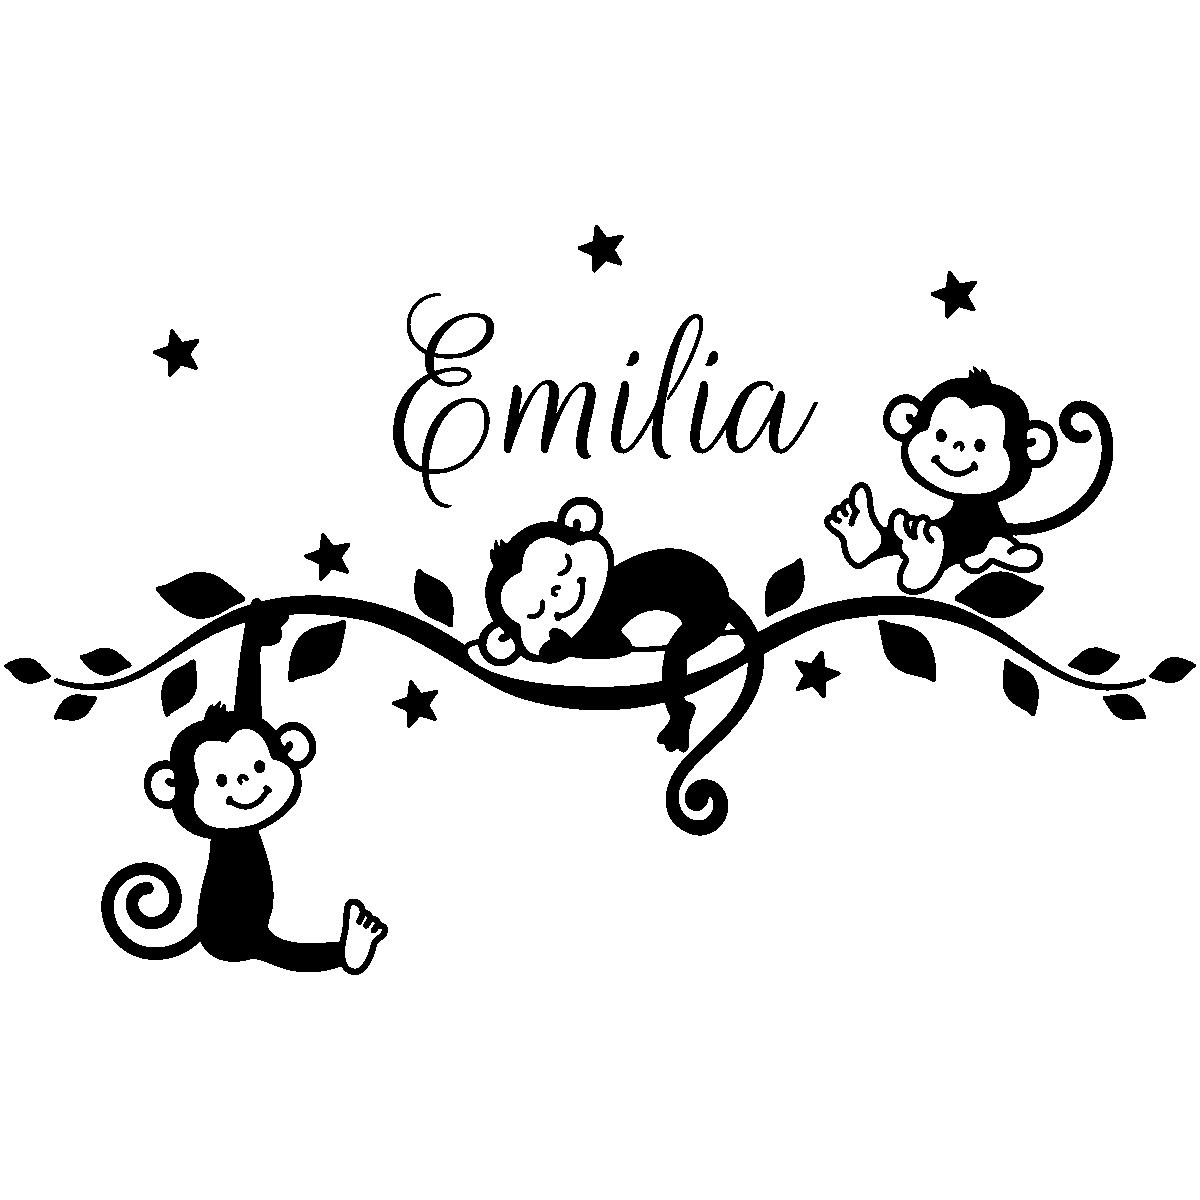 sticker pr nom personnalis singes jungle stickers animaux animaux de la jungle ambiance sticker. Black Bedroom Furniture Sets. Home Design Ideas